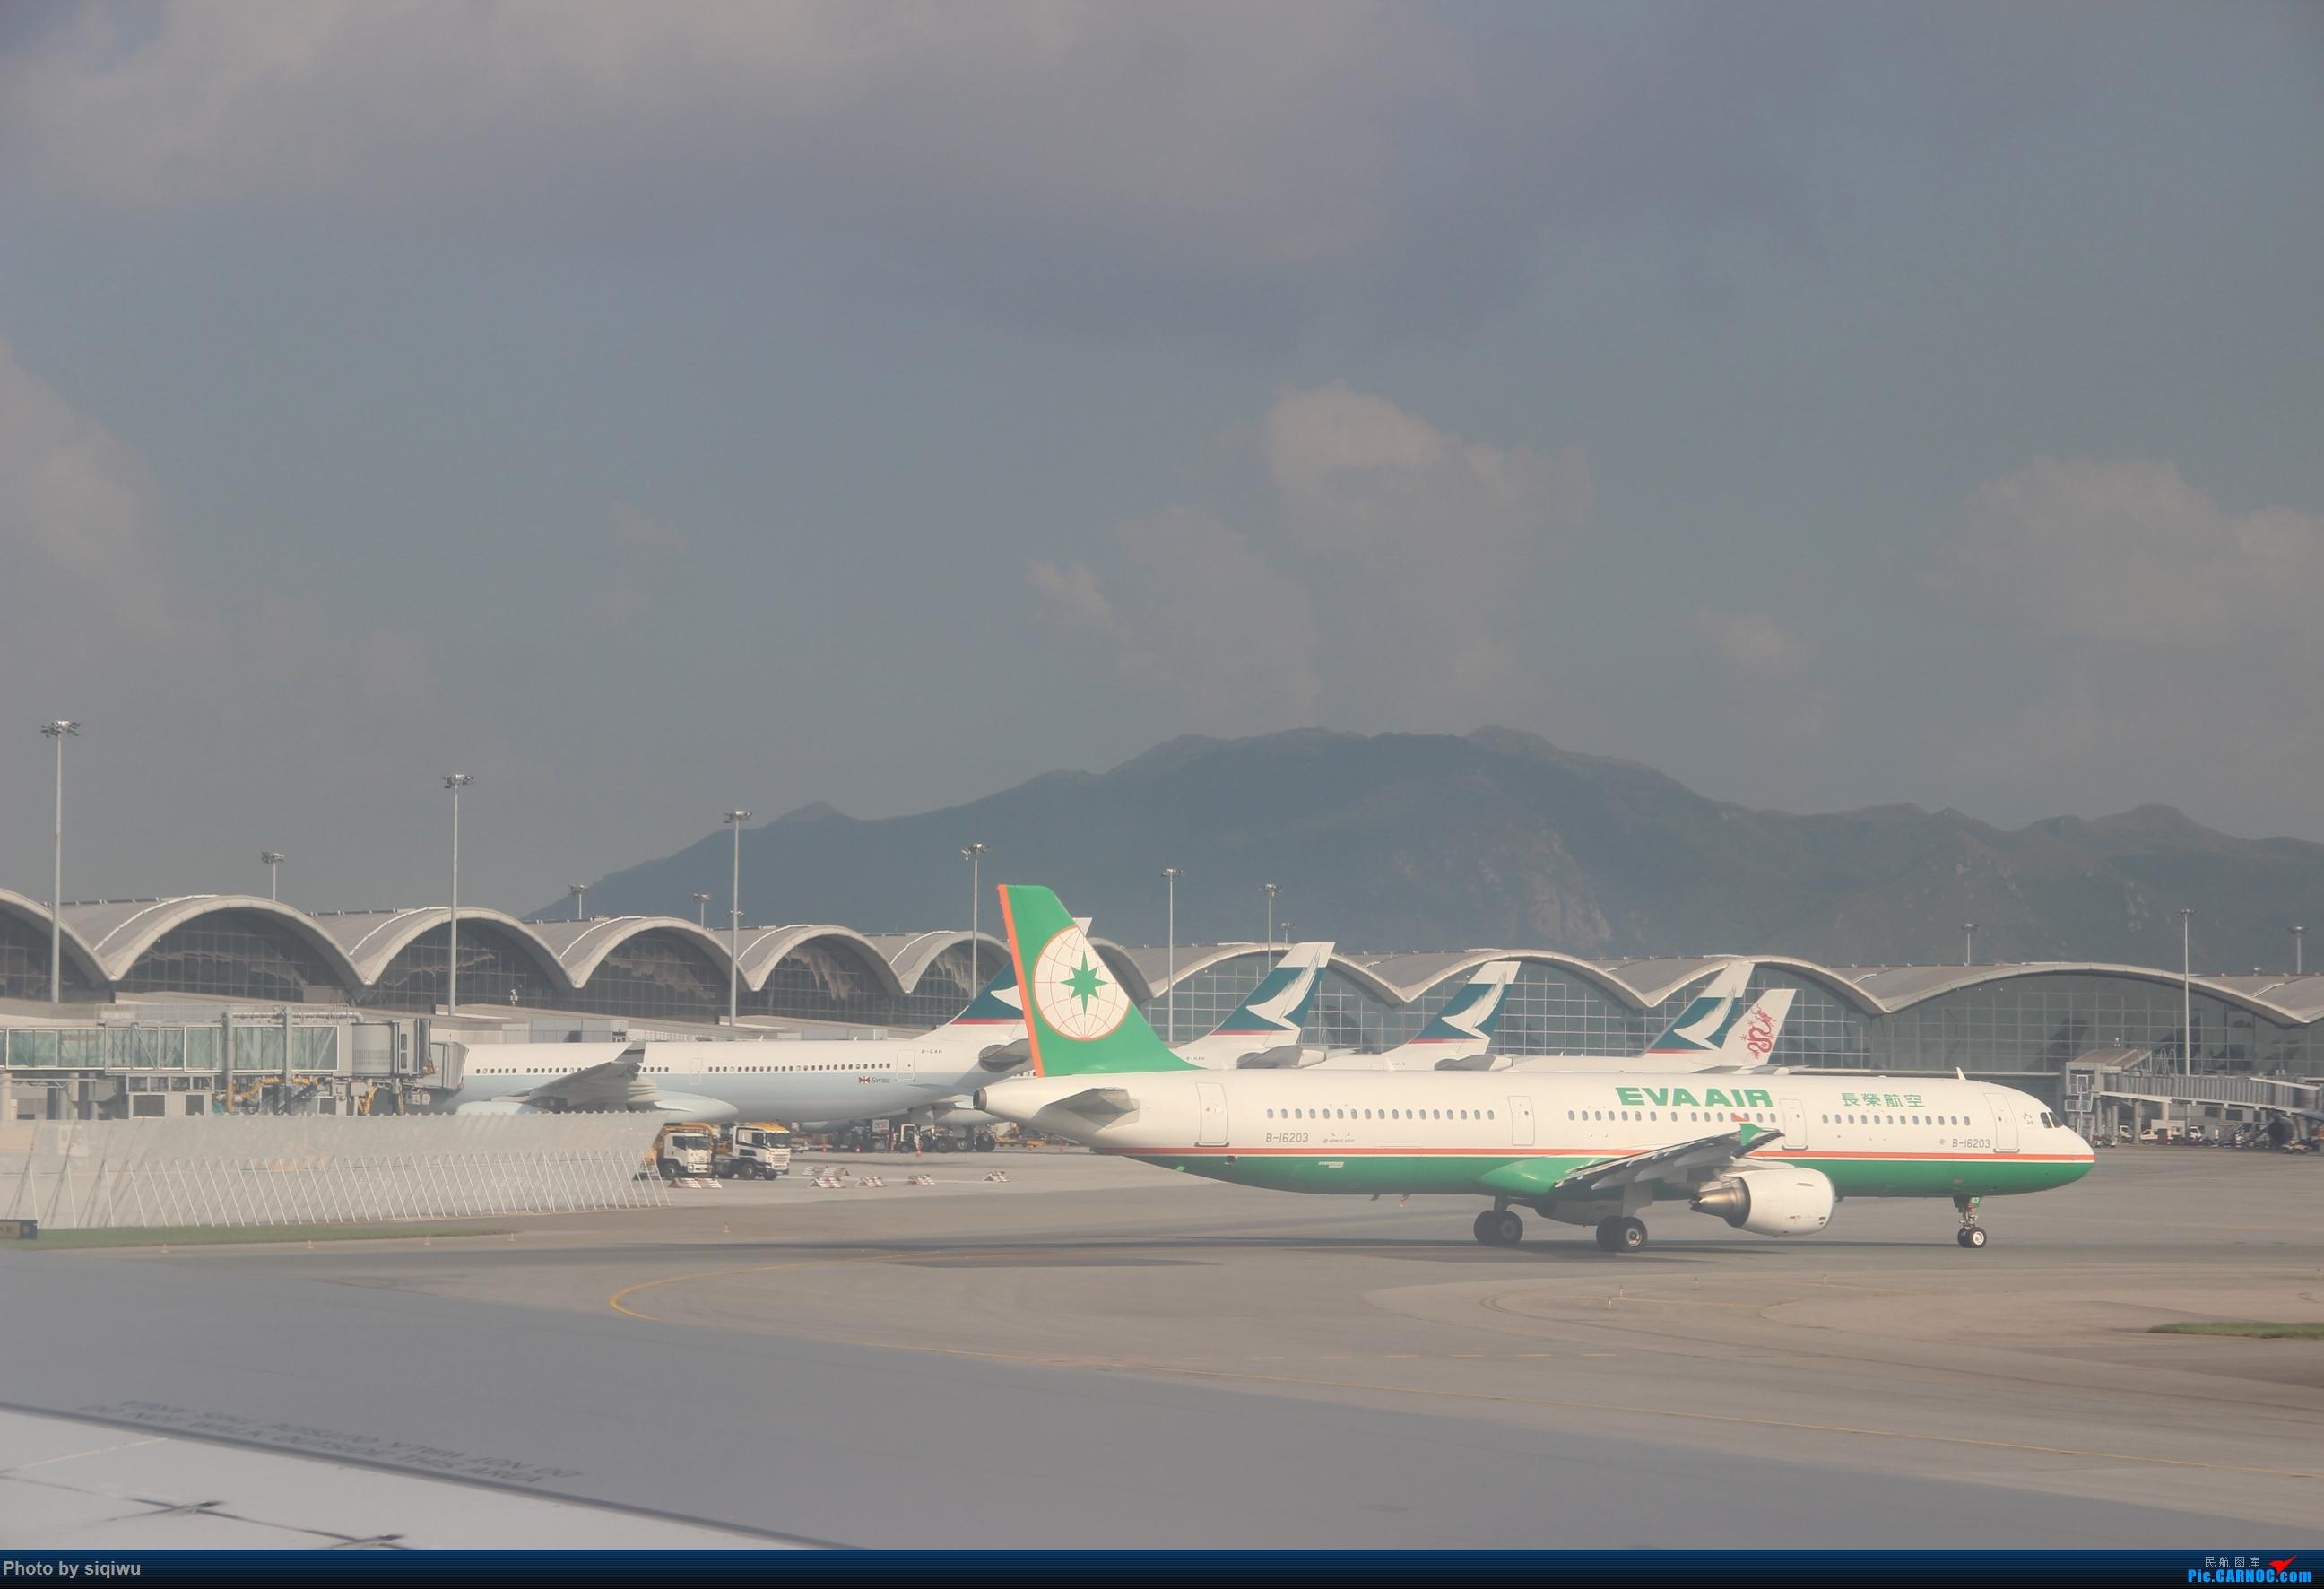 Re:[原创]PVG-HKG-KUL-HKG-PVG 四天往返,CX/KA   中国香港国际机场 中国香港国际机场